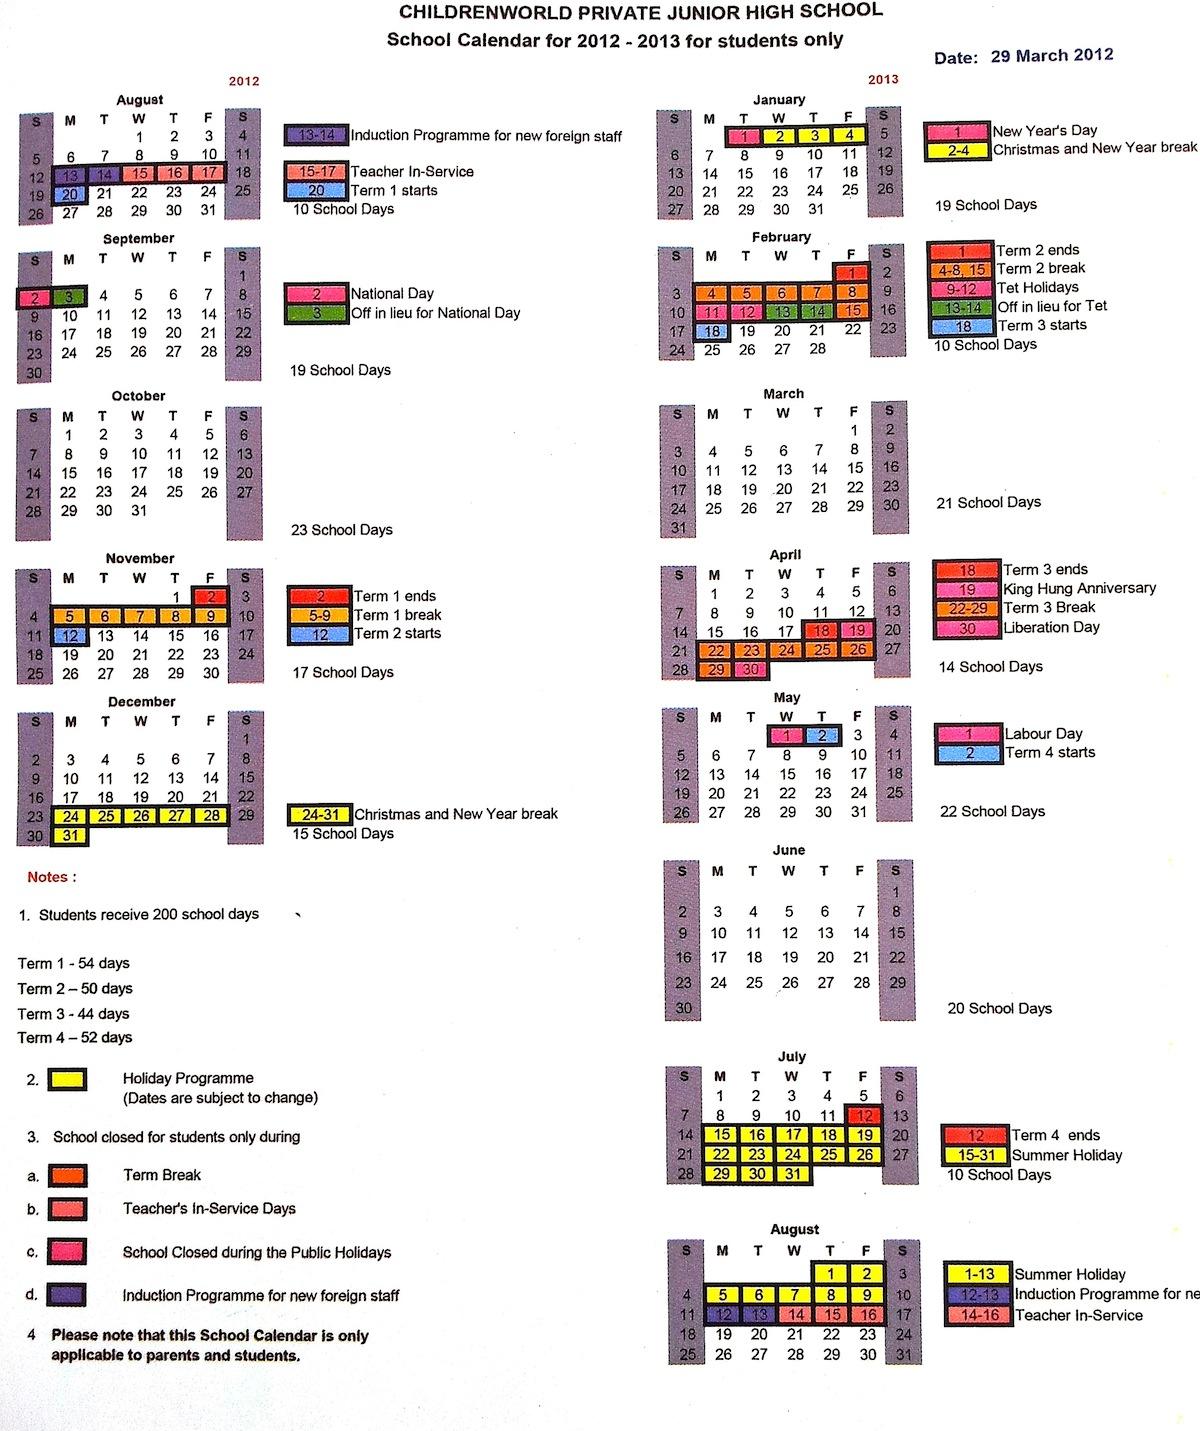 Calendar Year Q : Chulaschools mconline vn pablo